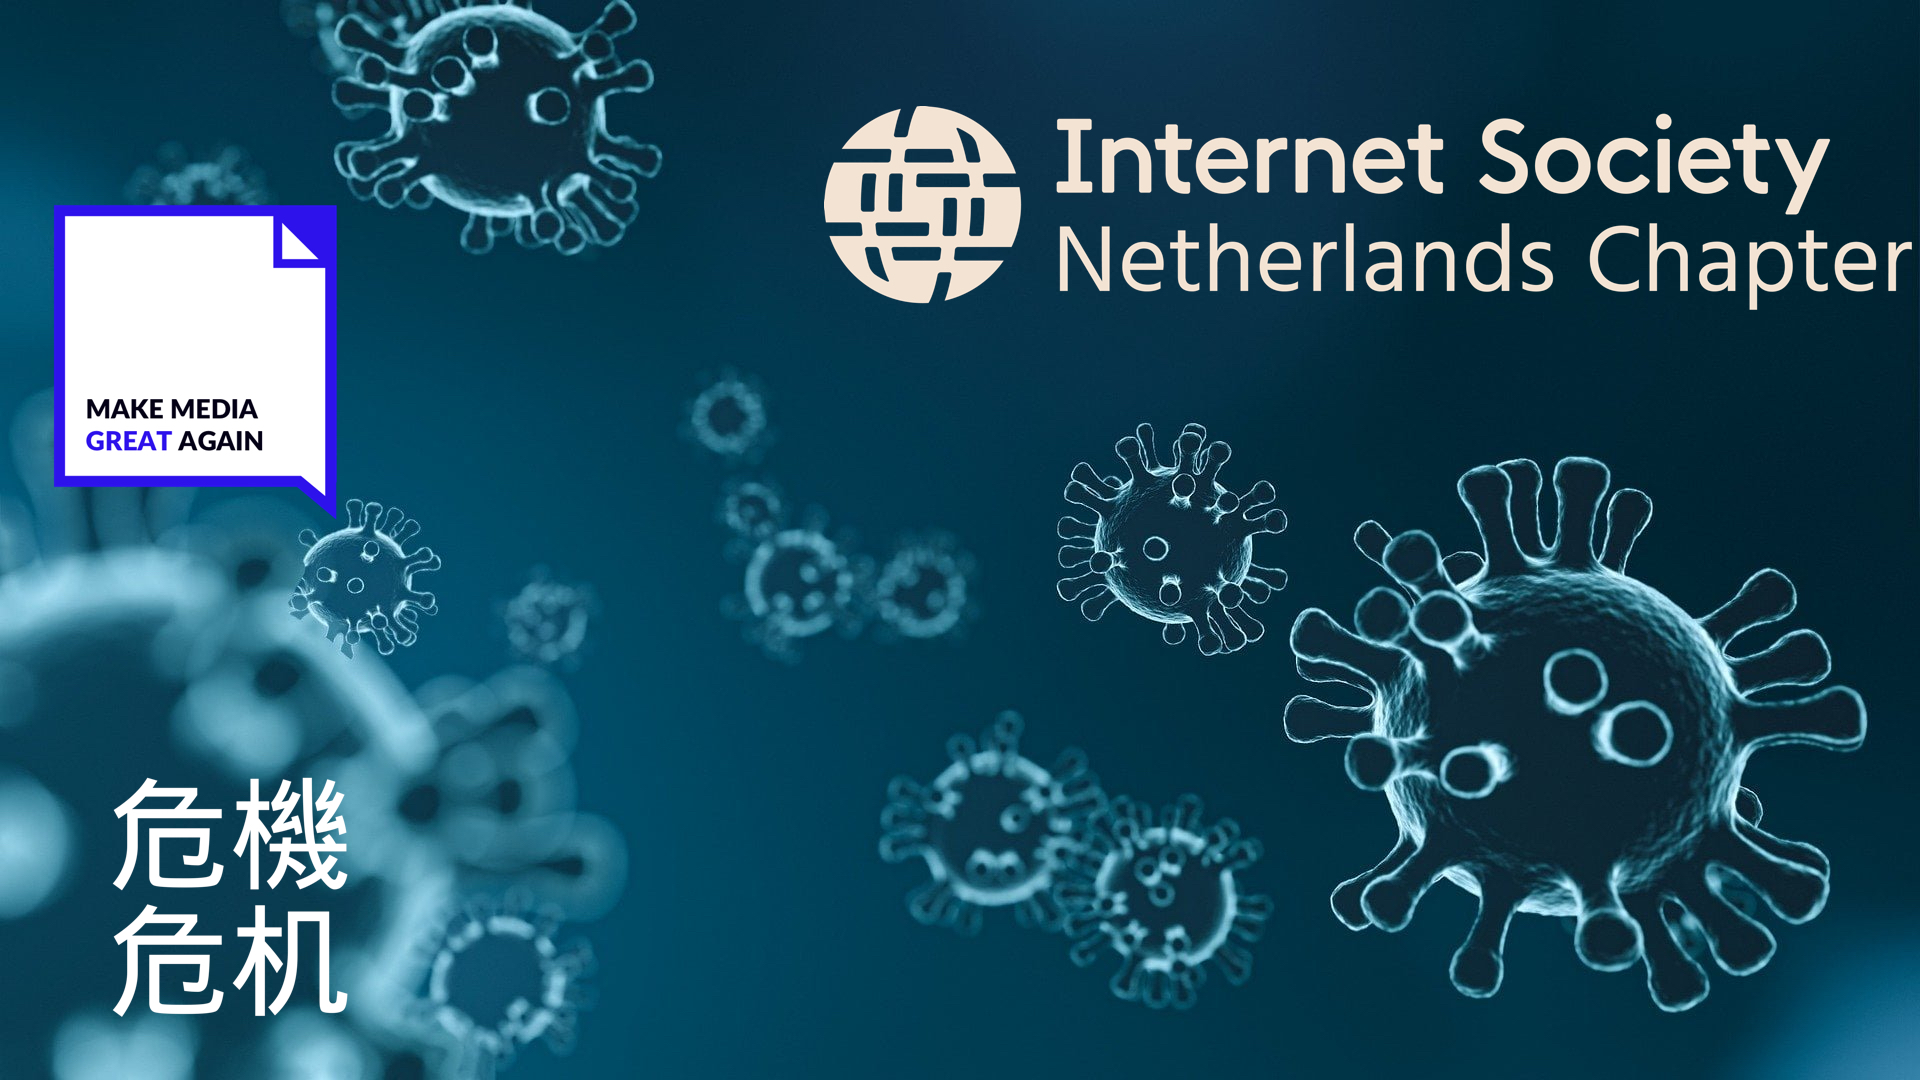 MMGA Corona virus ISOC NL- NEW 2021.jpg